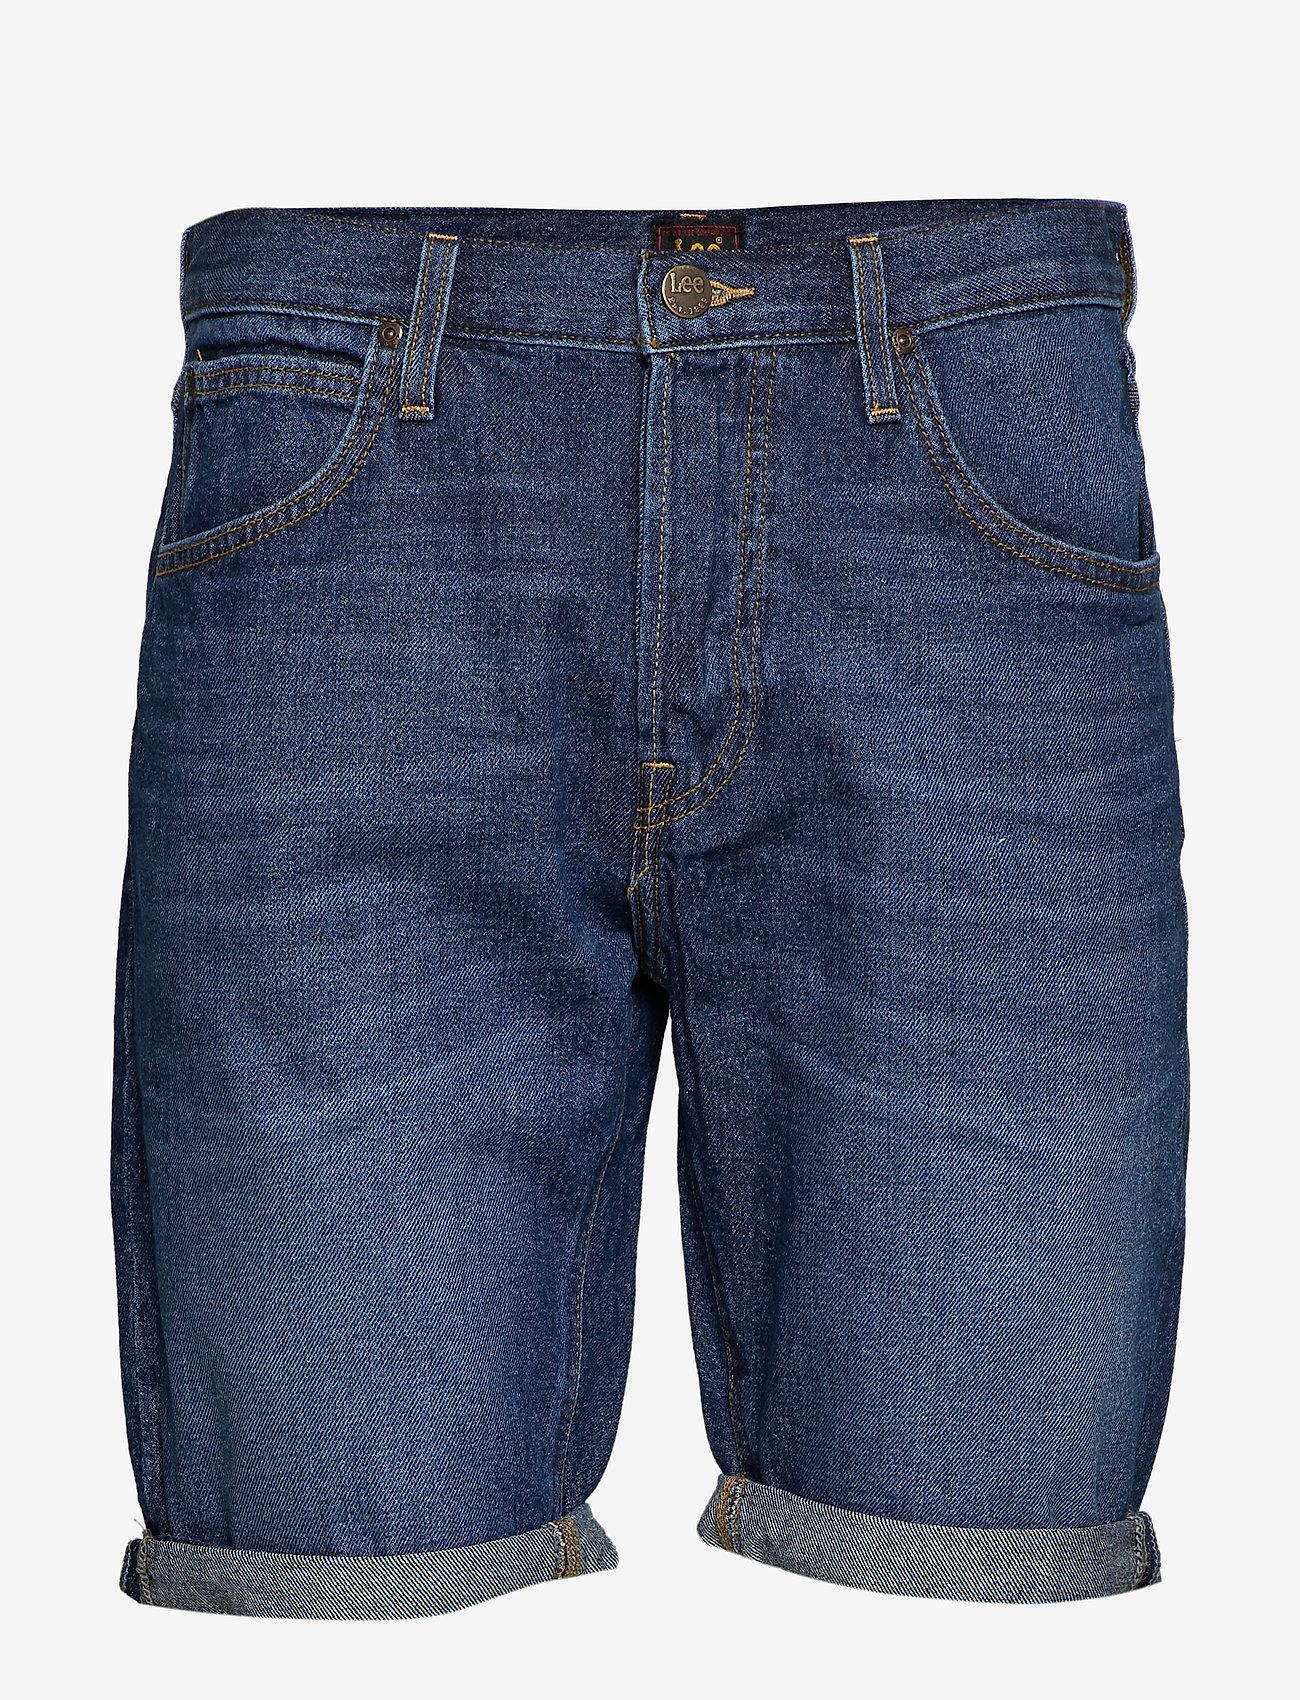 Lee Jeans - 5 POCKET SHORT - farkkushortsit - spritz - 0